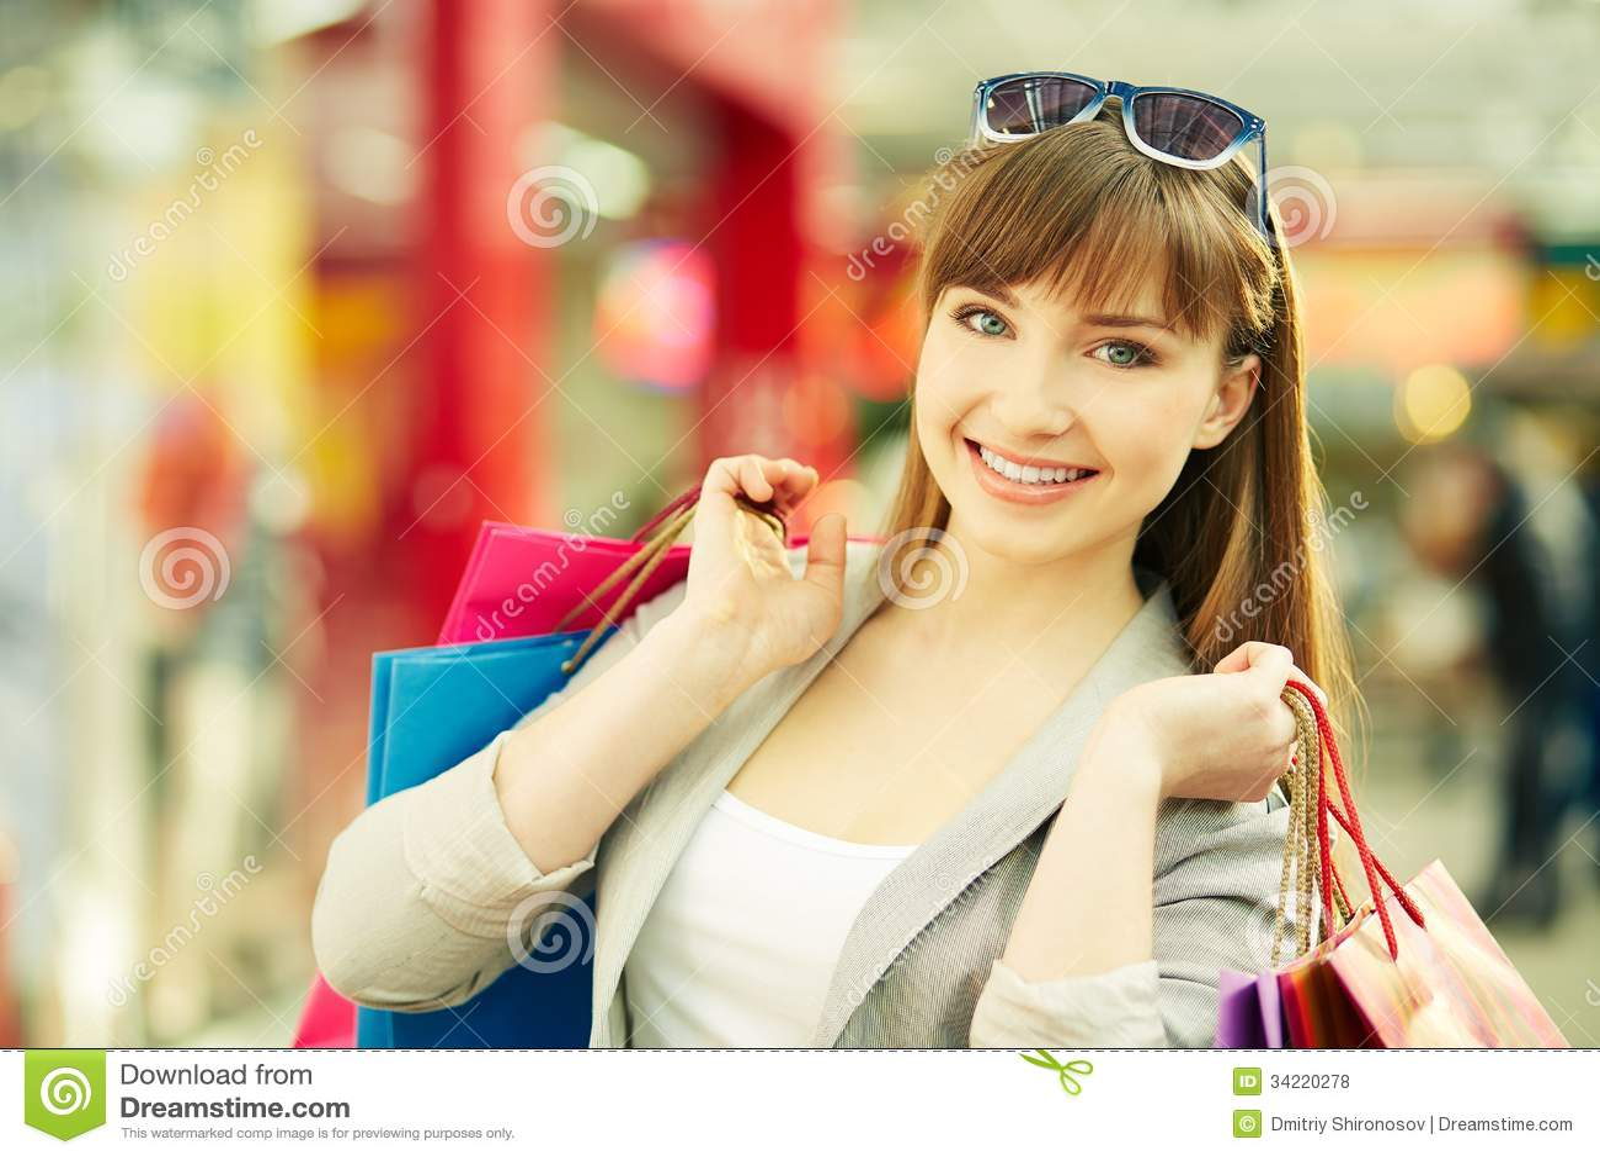 Satisfied Customer Royalty Free Stock Photos